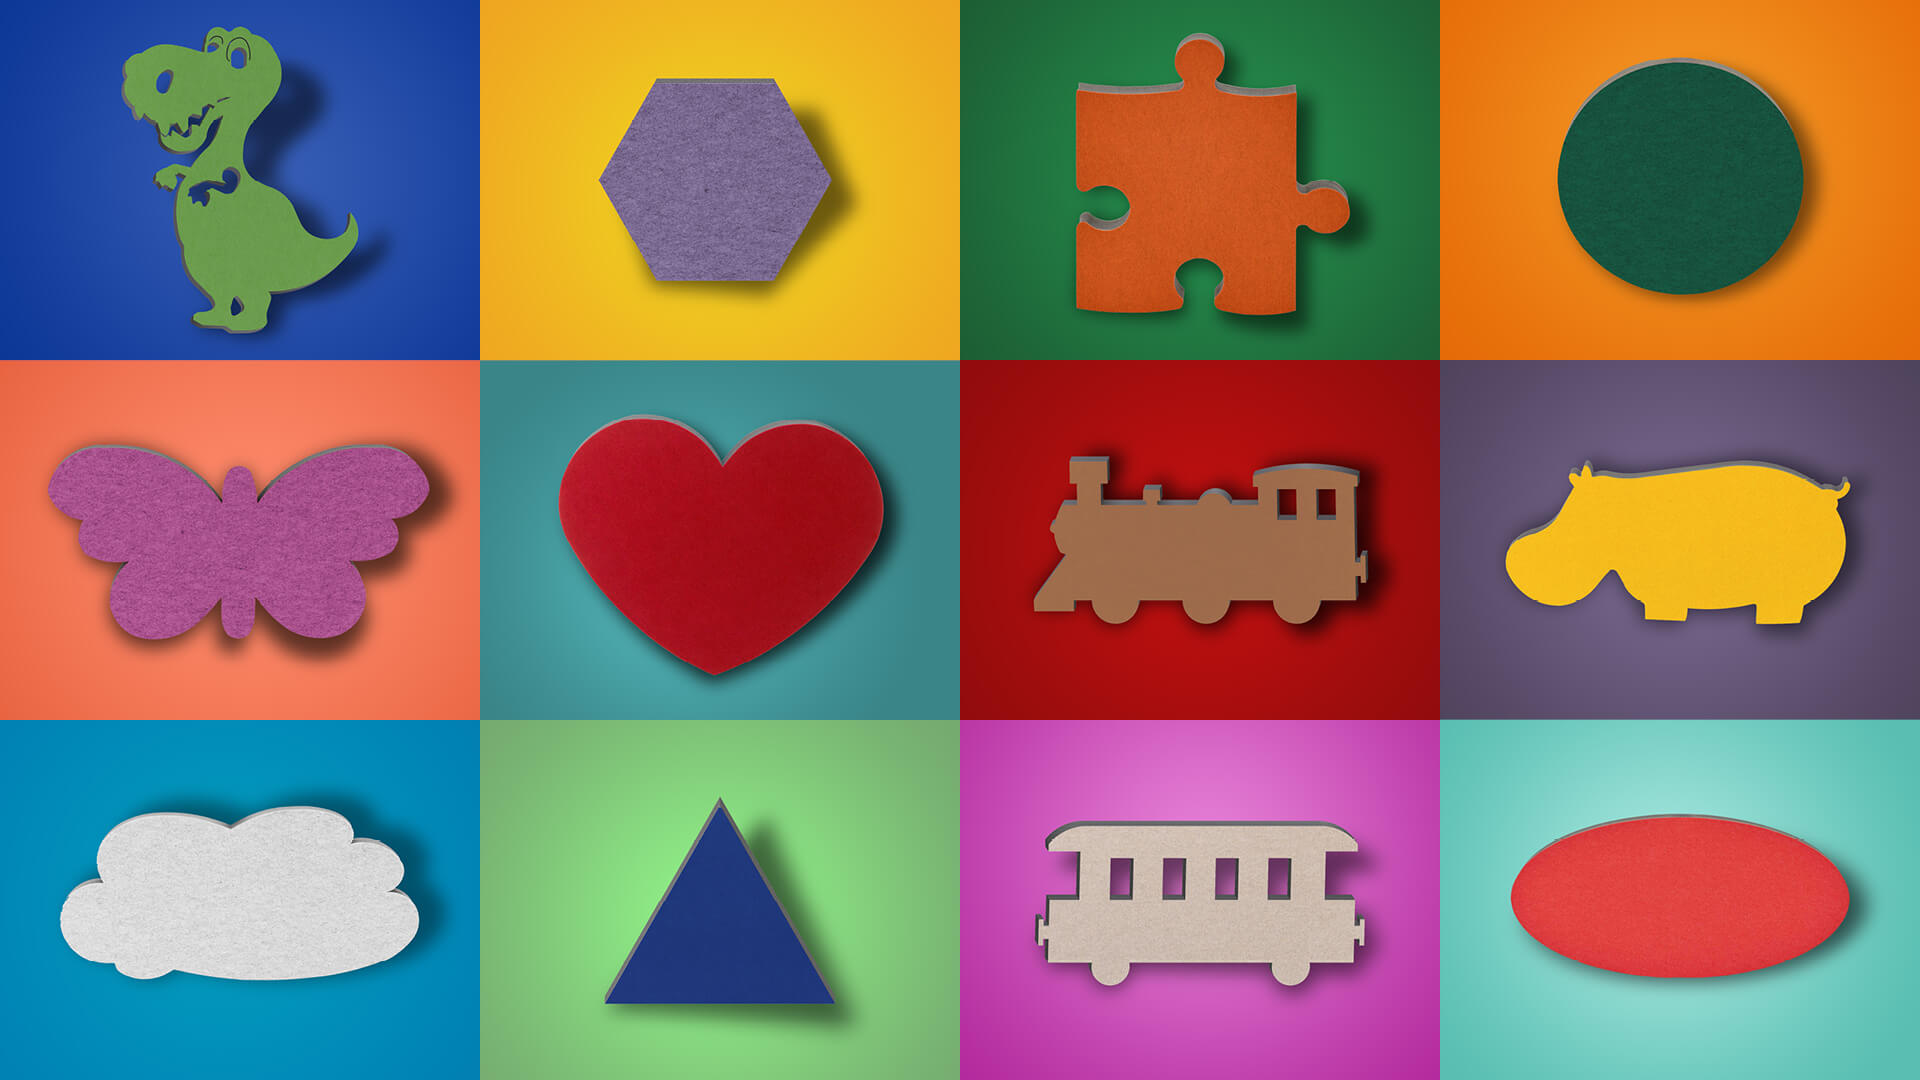 aixFOAM motif sound absorbers - sound absorbers in colored motifs